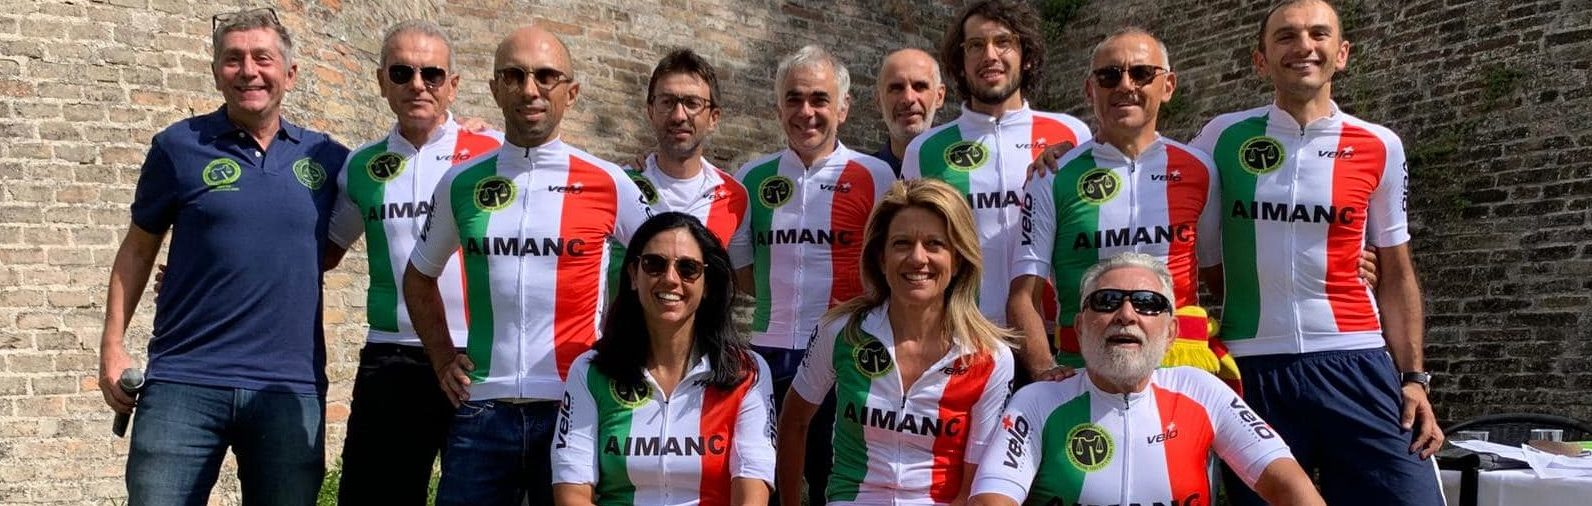 I Campioni d'Italia Aimanc 2019 Gara in Linea